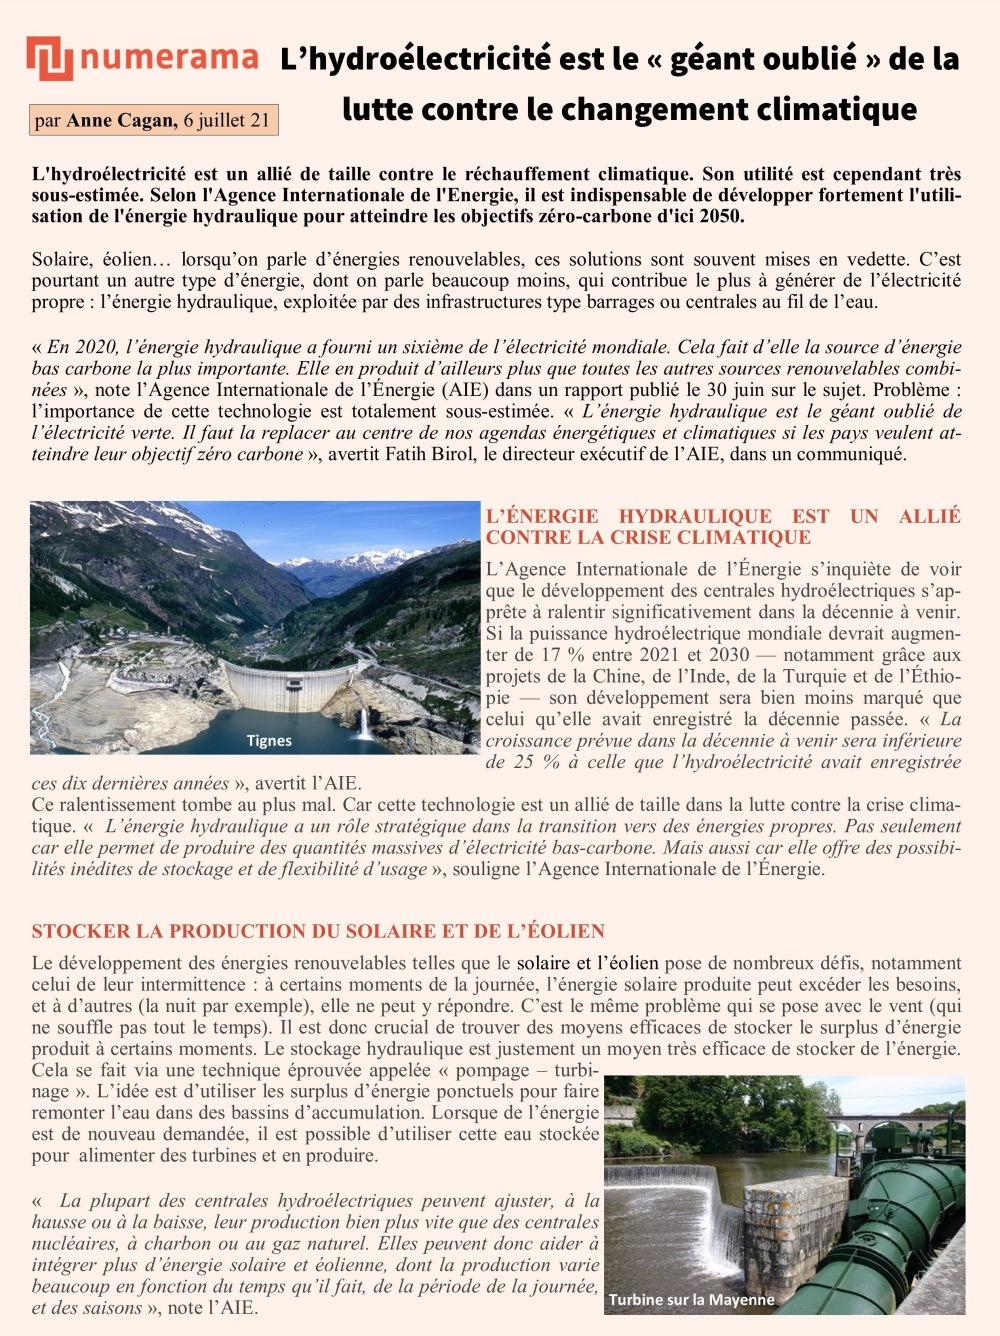 hydroelectrcite-le-geant-oublie-numerama_1